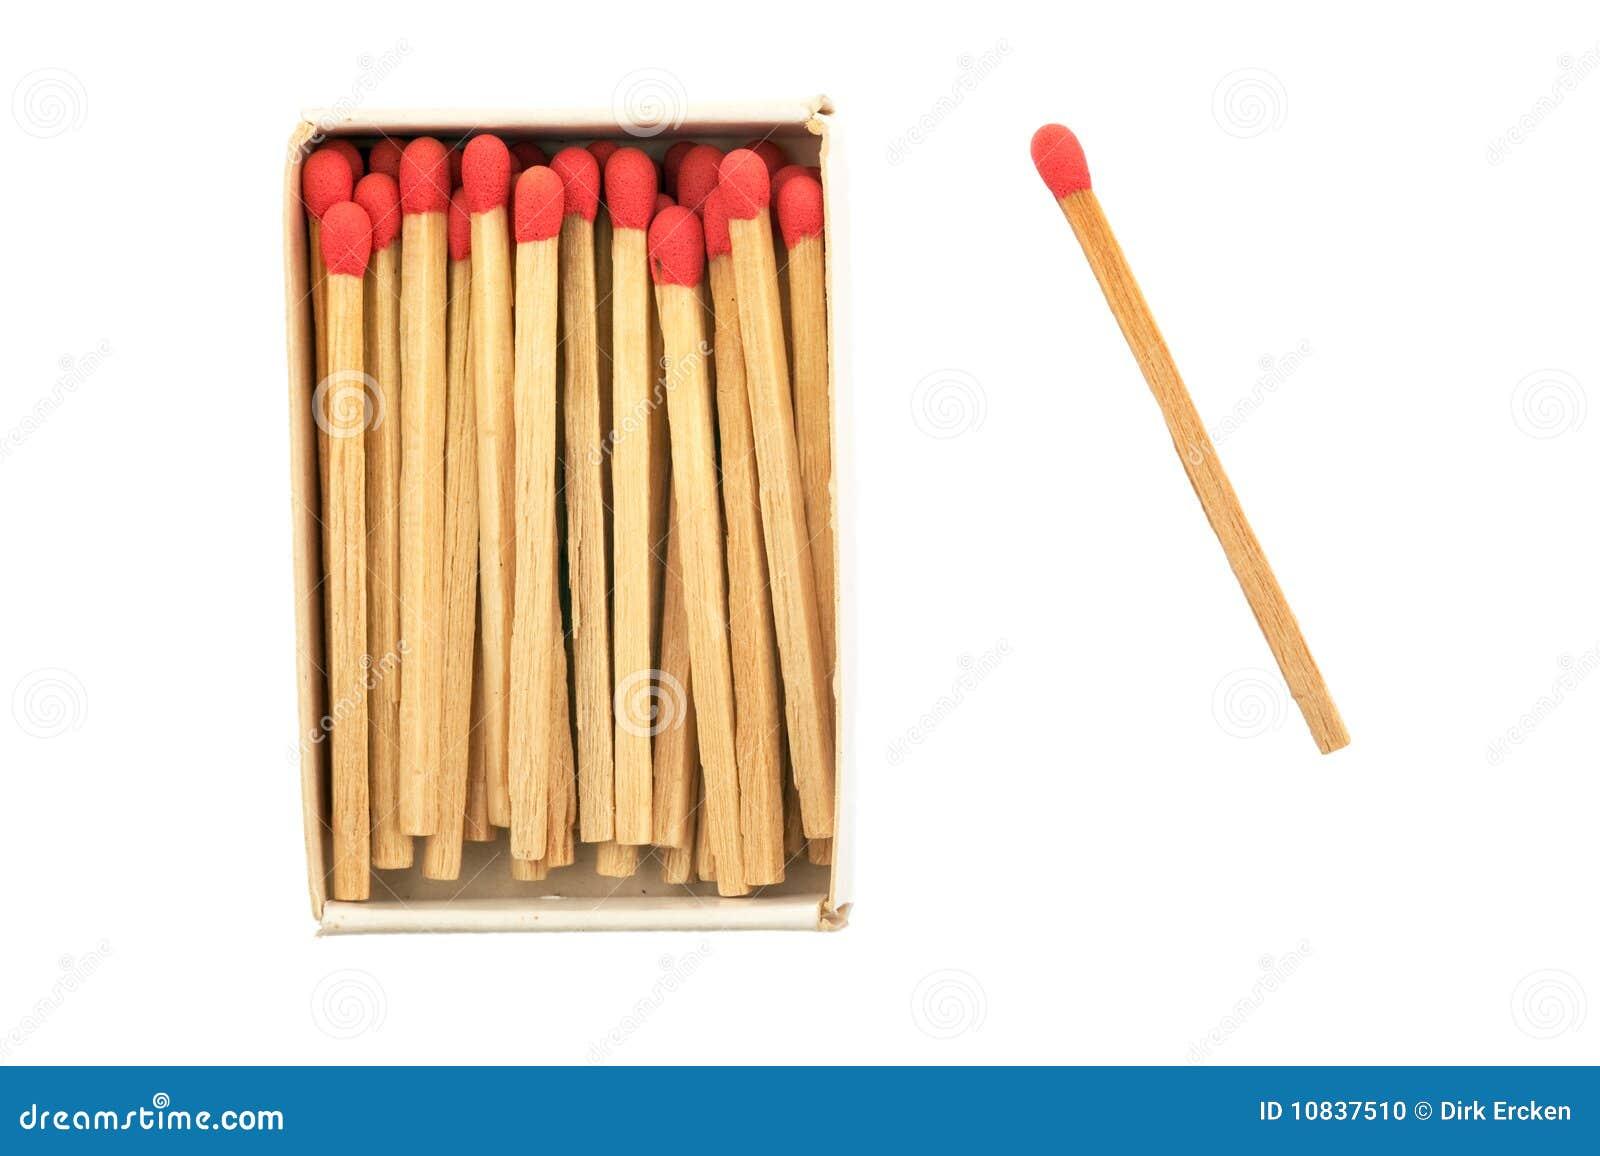 sulfur matches matchbox isolated start light fire